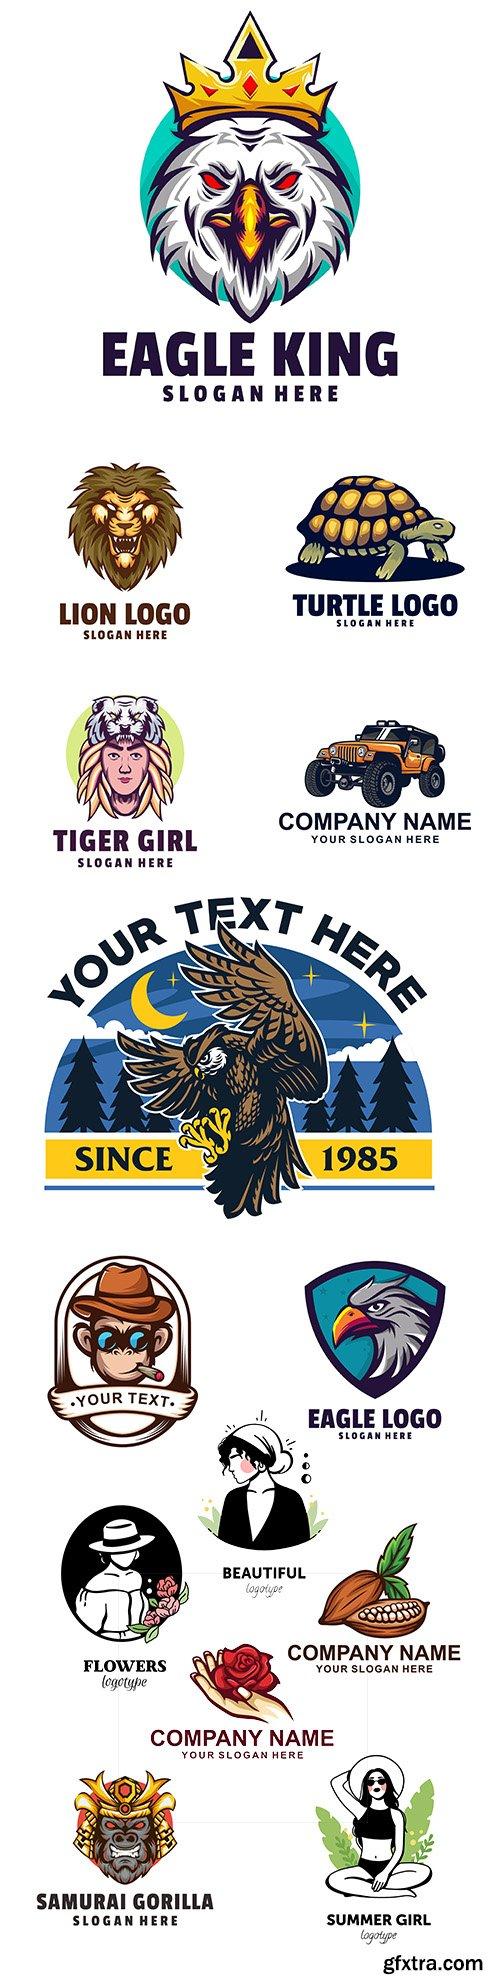 Brand name company business corporate logos design 26